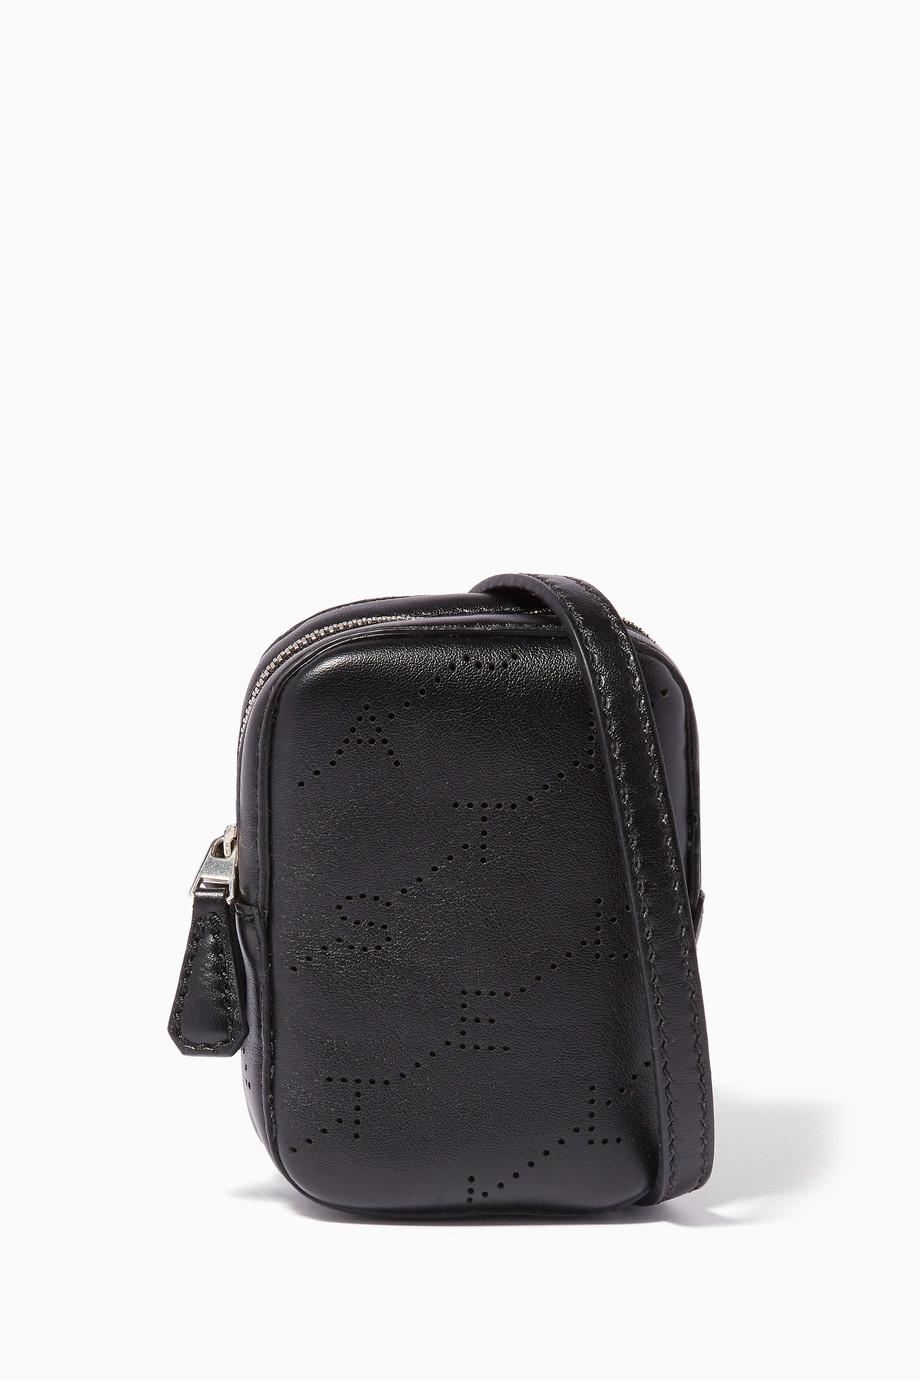 2ff24a0a28452 تسوق حقيبة كروس فلايت صغيرة سوداء ستيلا مكارتني أسود للنساء